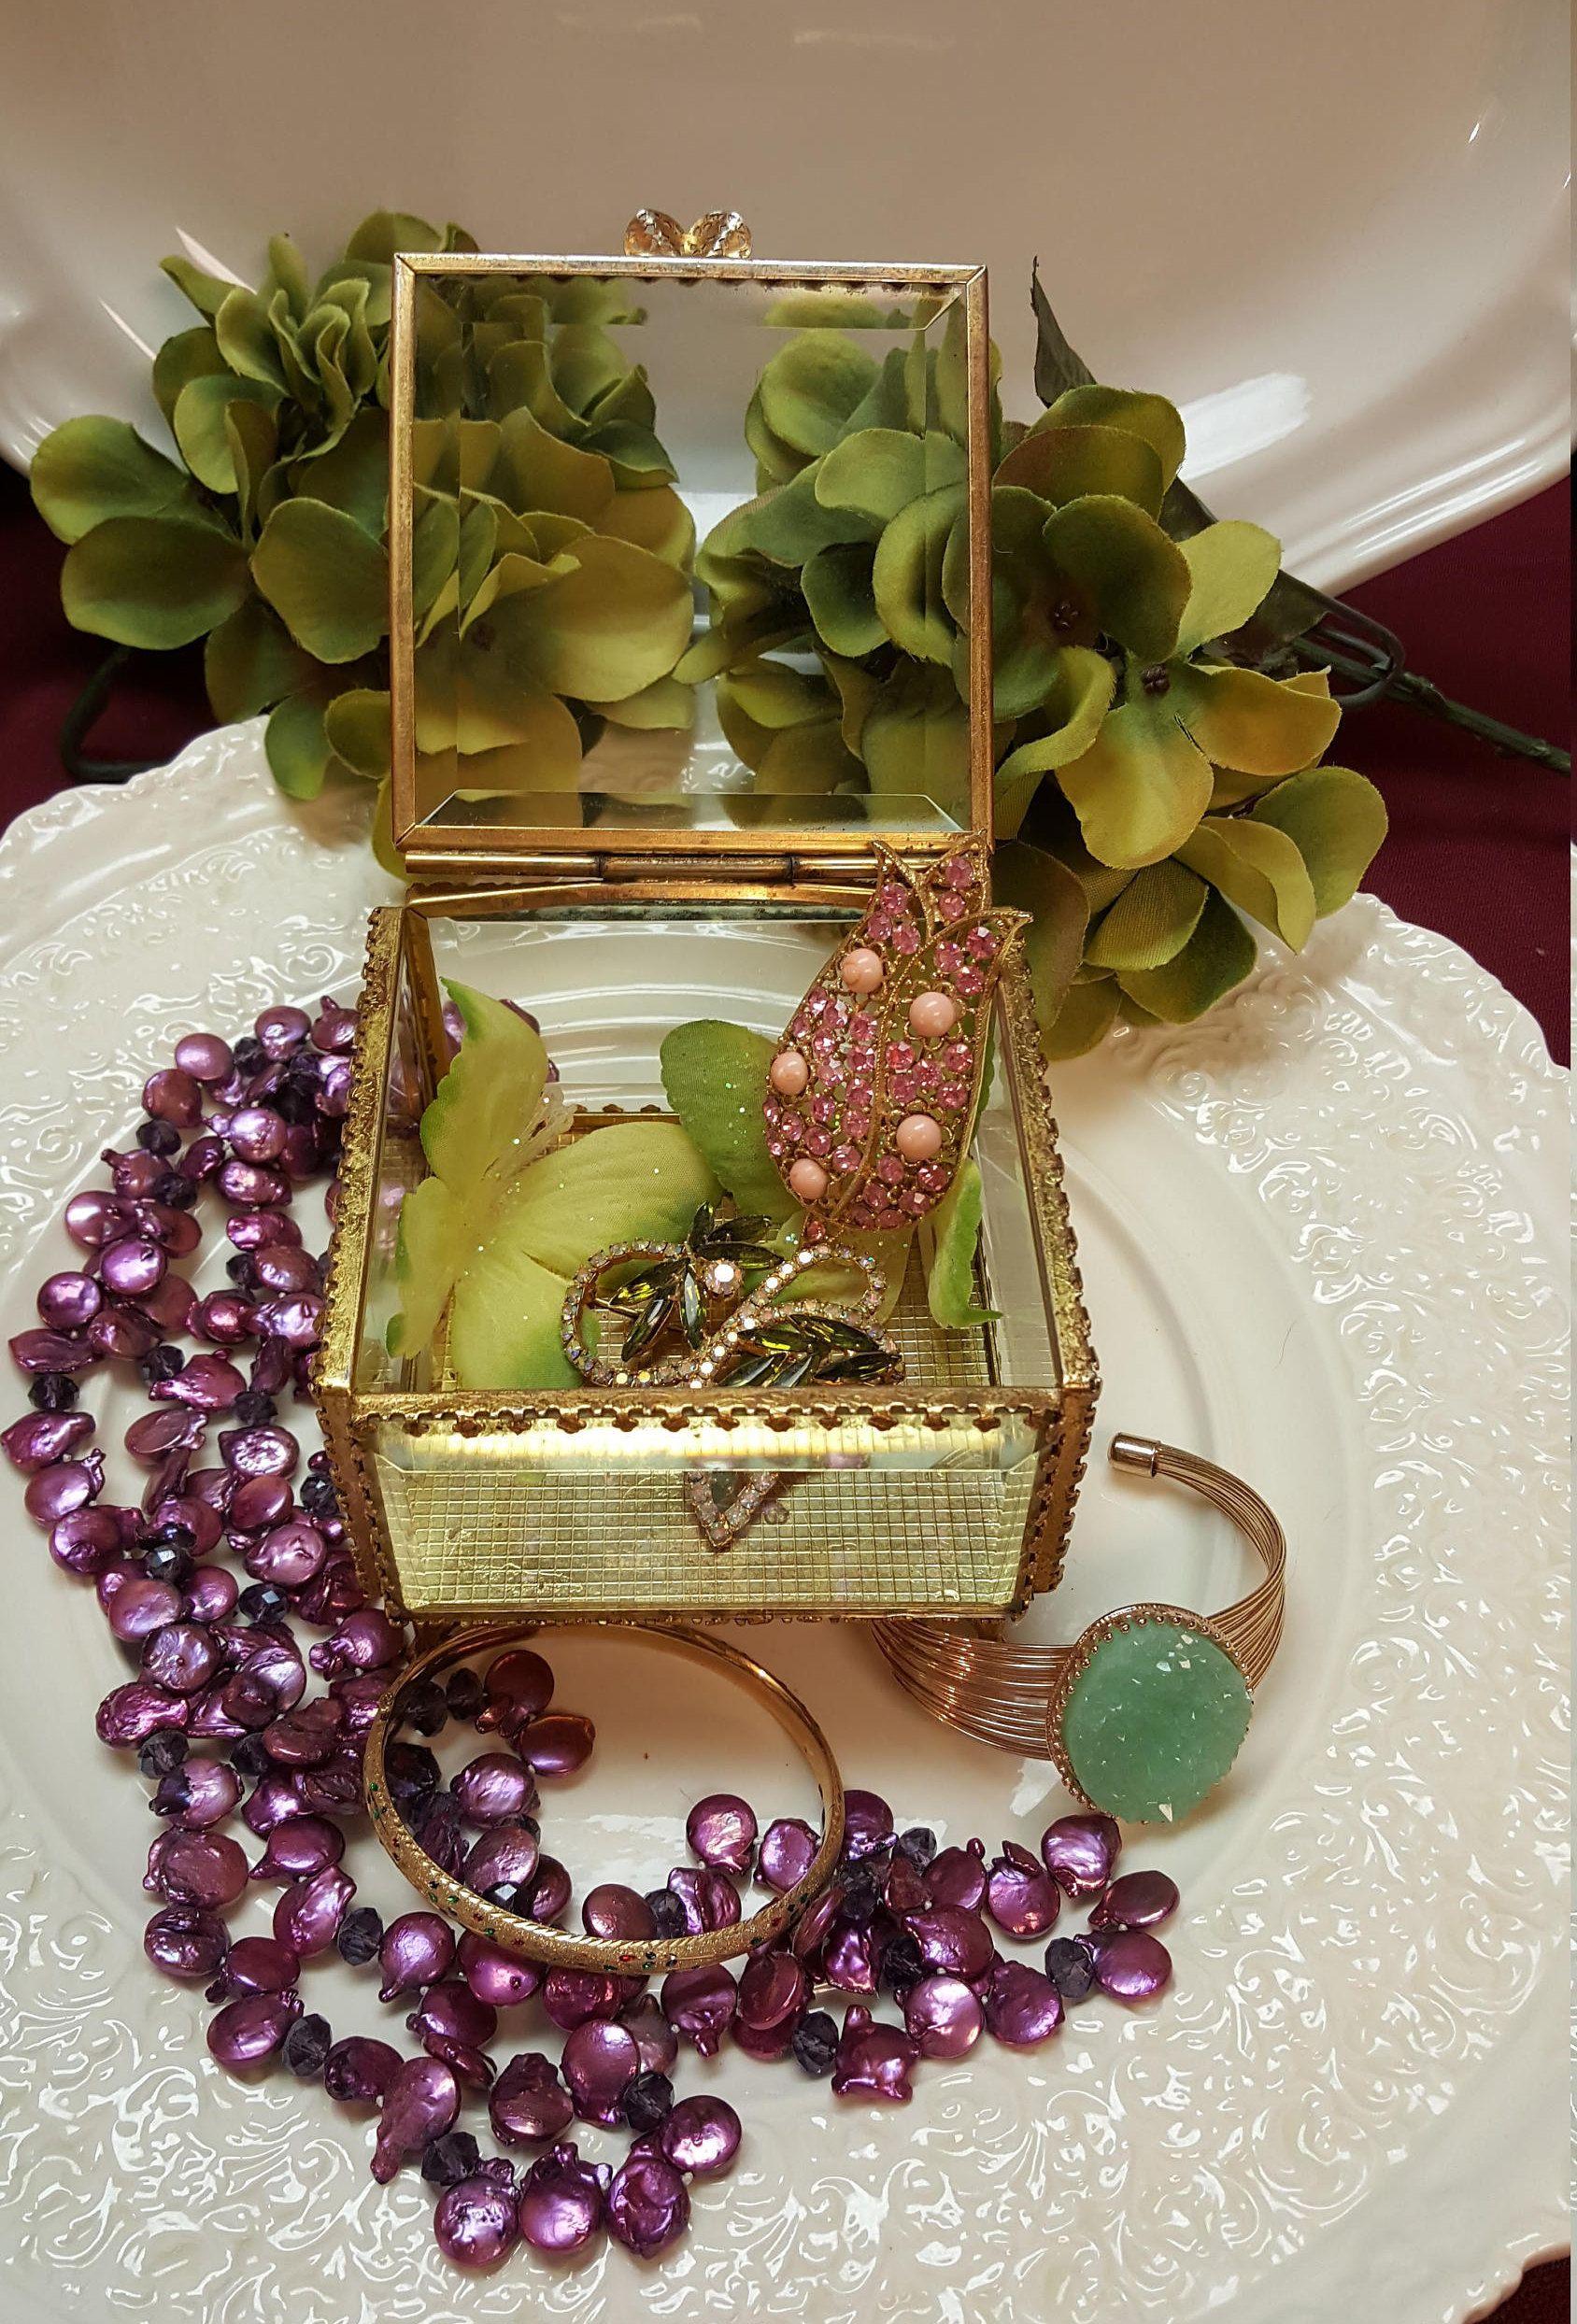 Gold Ormolu Jewelry Box Beveled Glass Vintage Jewelry Casket Ring